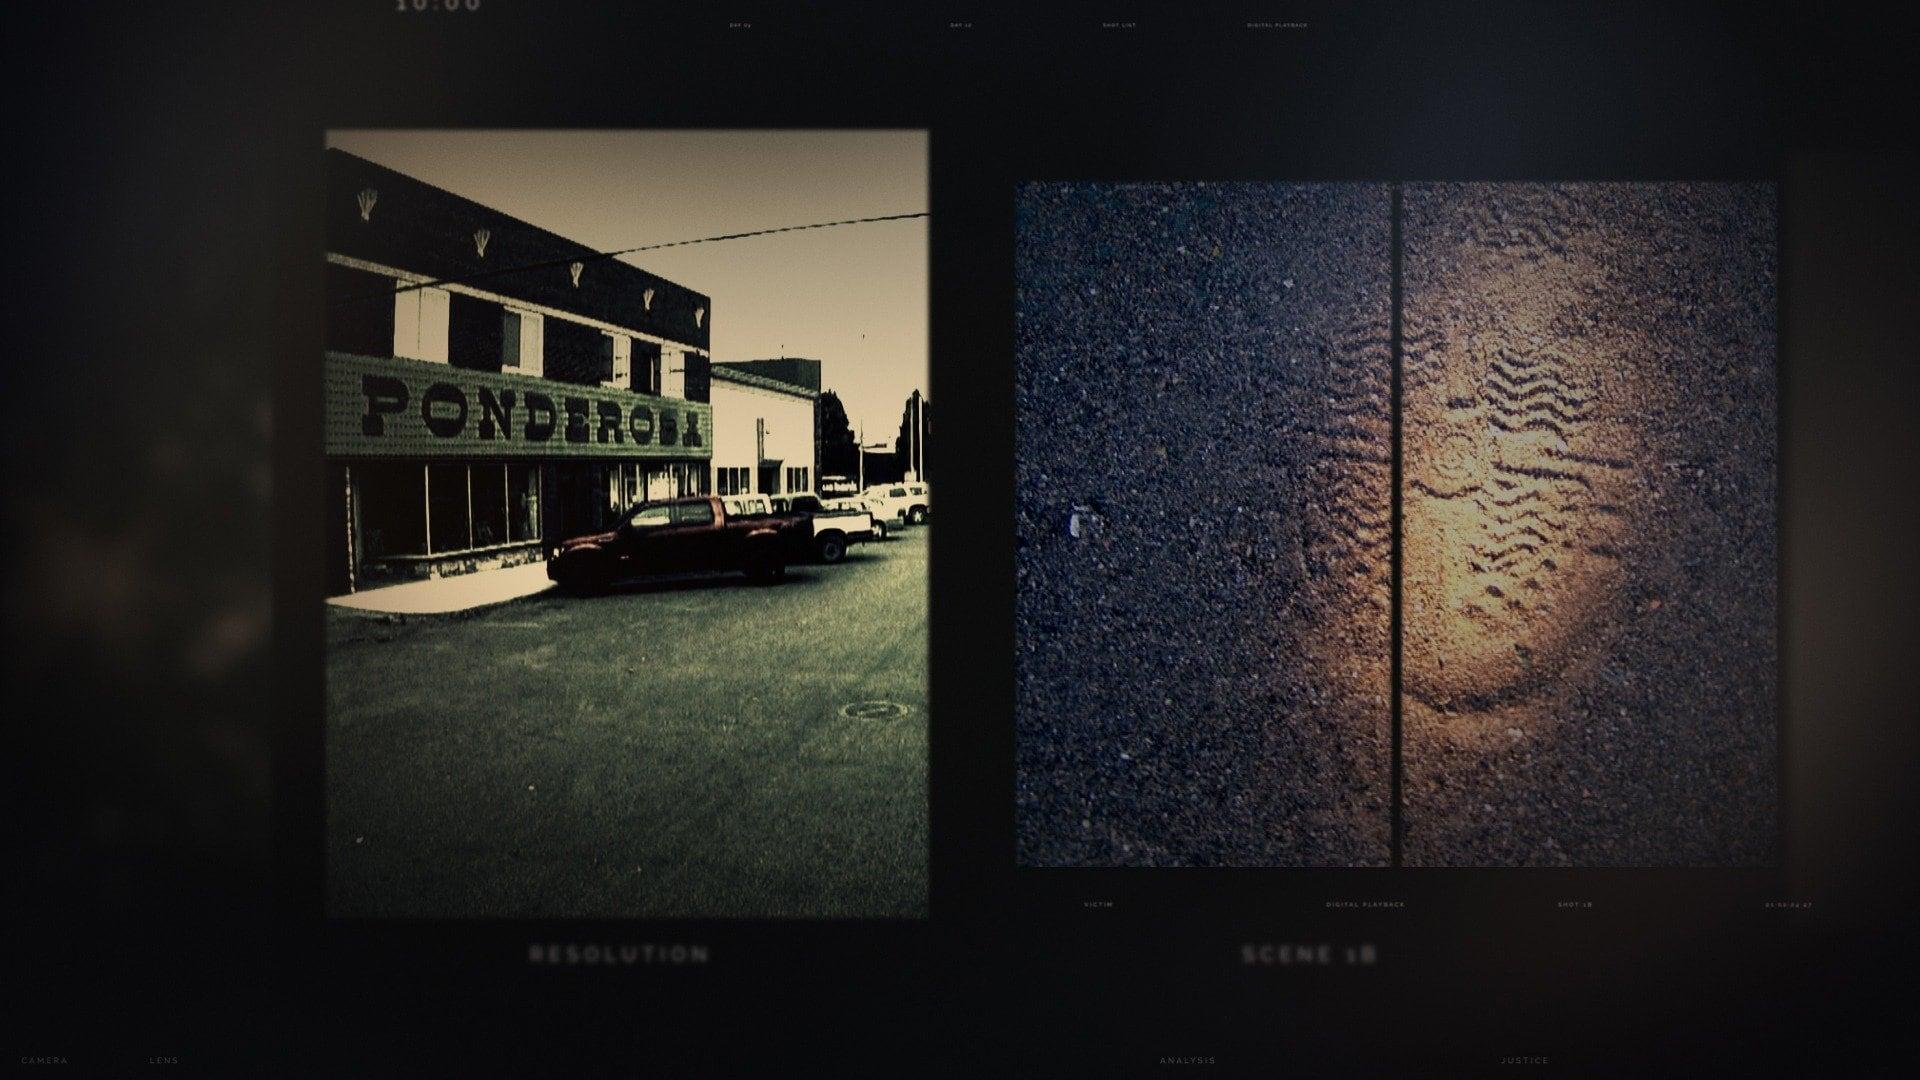 Footprint in the Dust